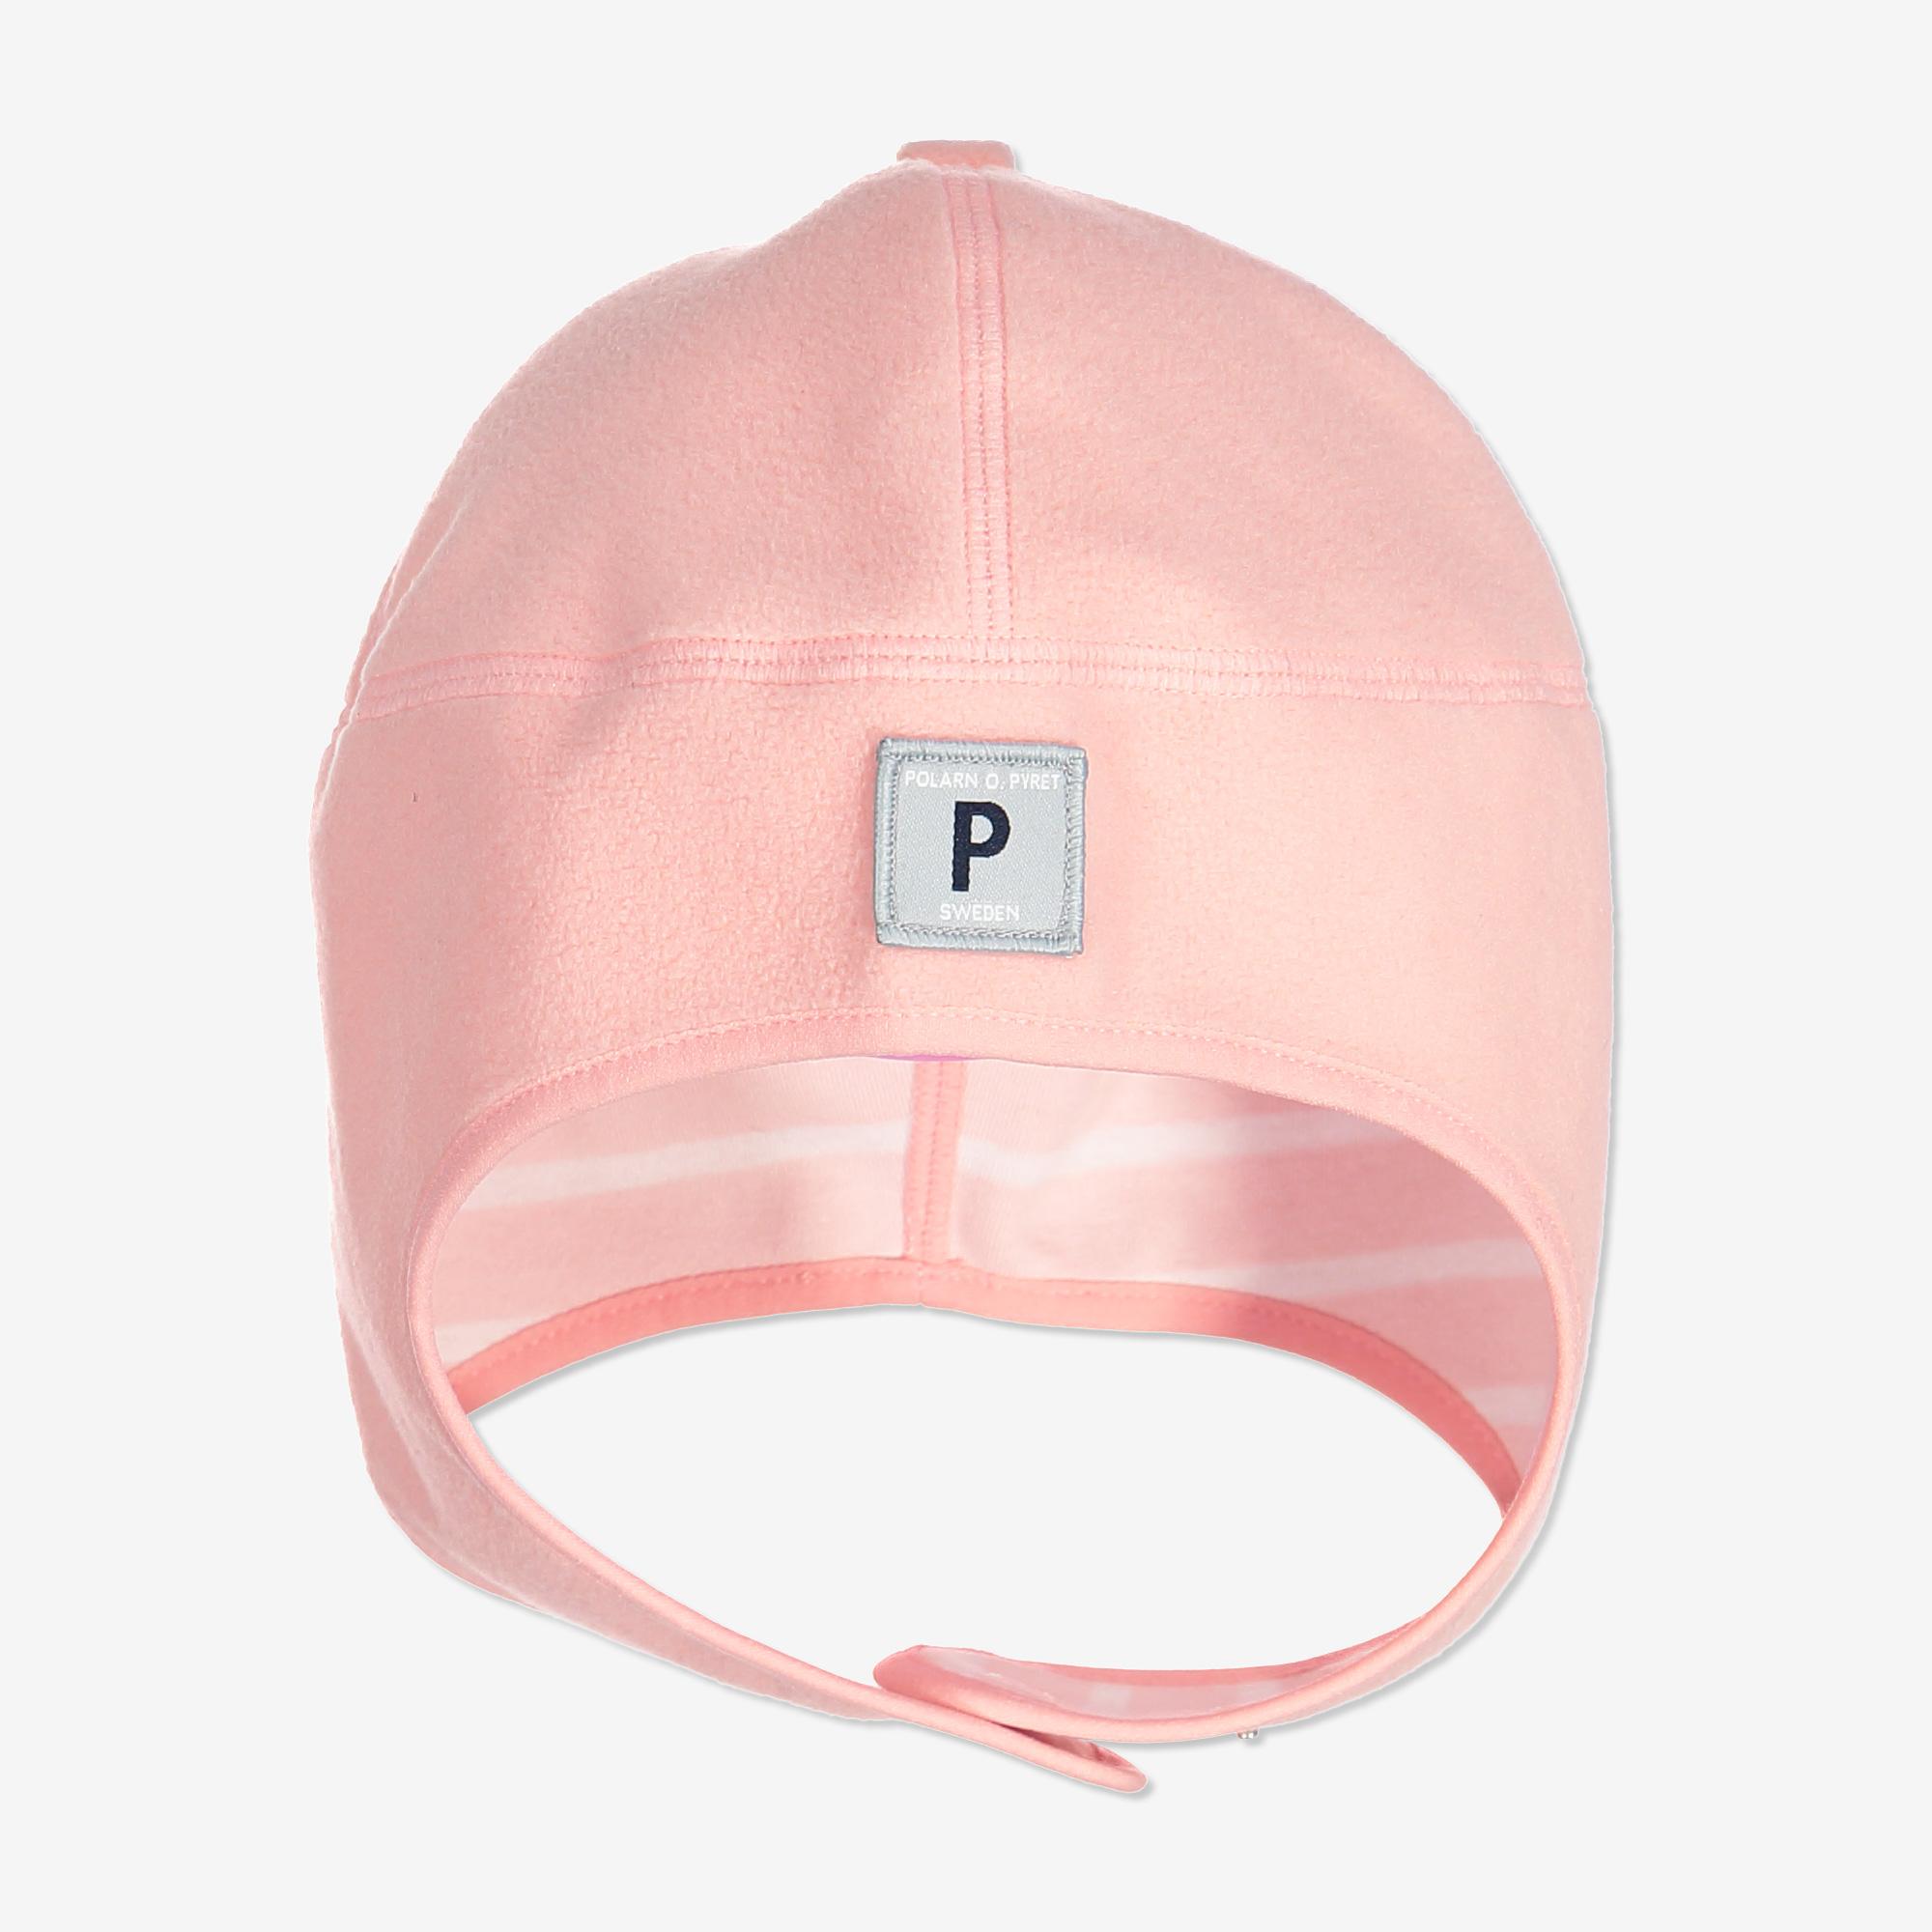 Vauvan windfleece-hattu roosa  a773848324